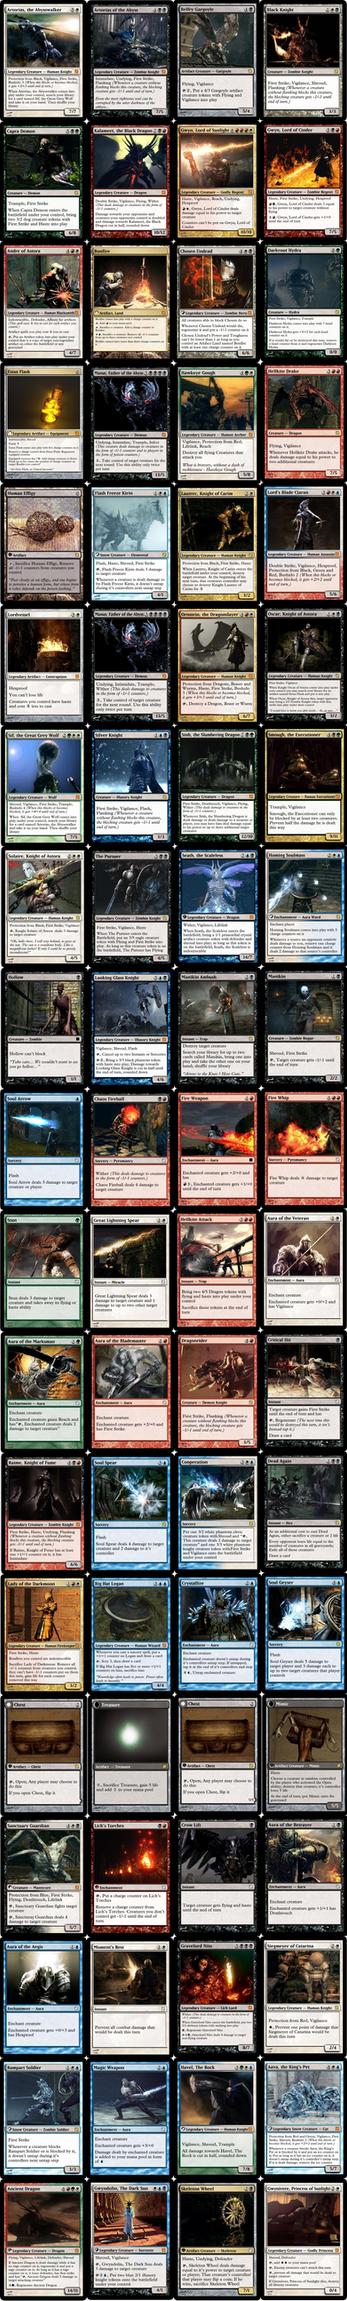 Dark Souls  (I+II) Magic Card Prototypes by skywalker-96